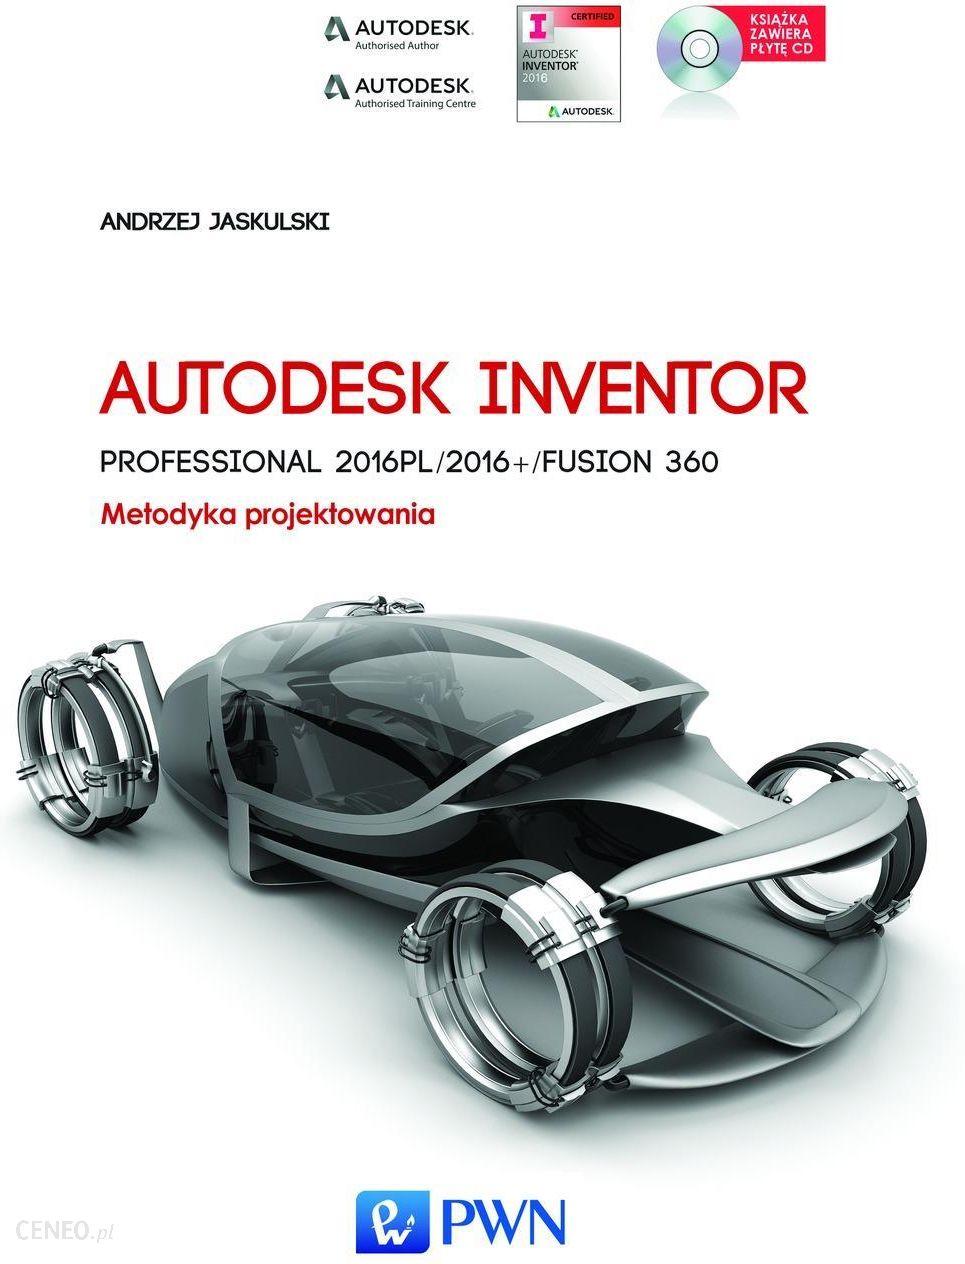 podr cznik do informatyki autodesk inventor professional 2016pl 2016 fusion fusion 360. Black Bedroom Furniture Sets. Home Design Ideas